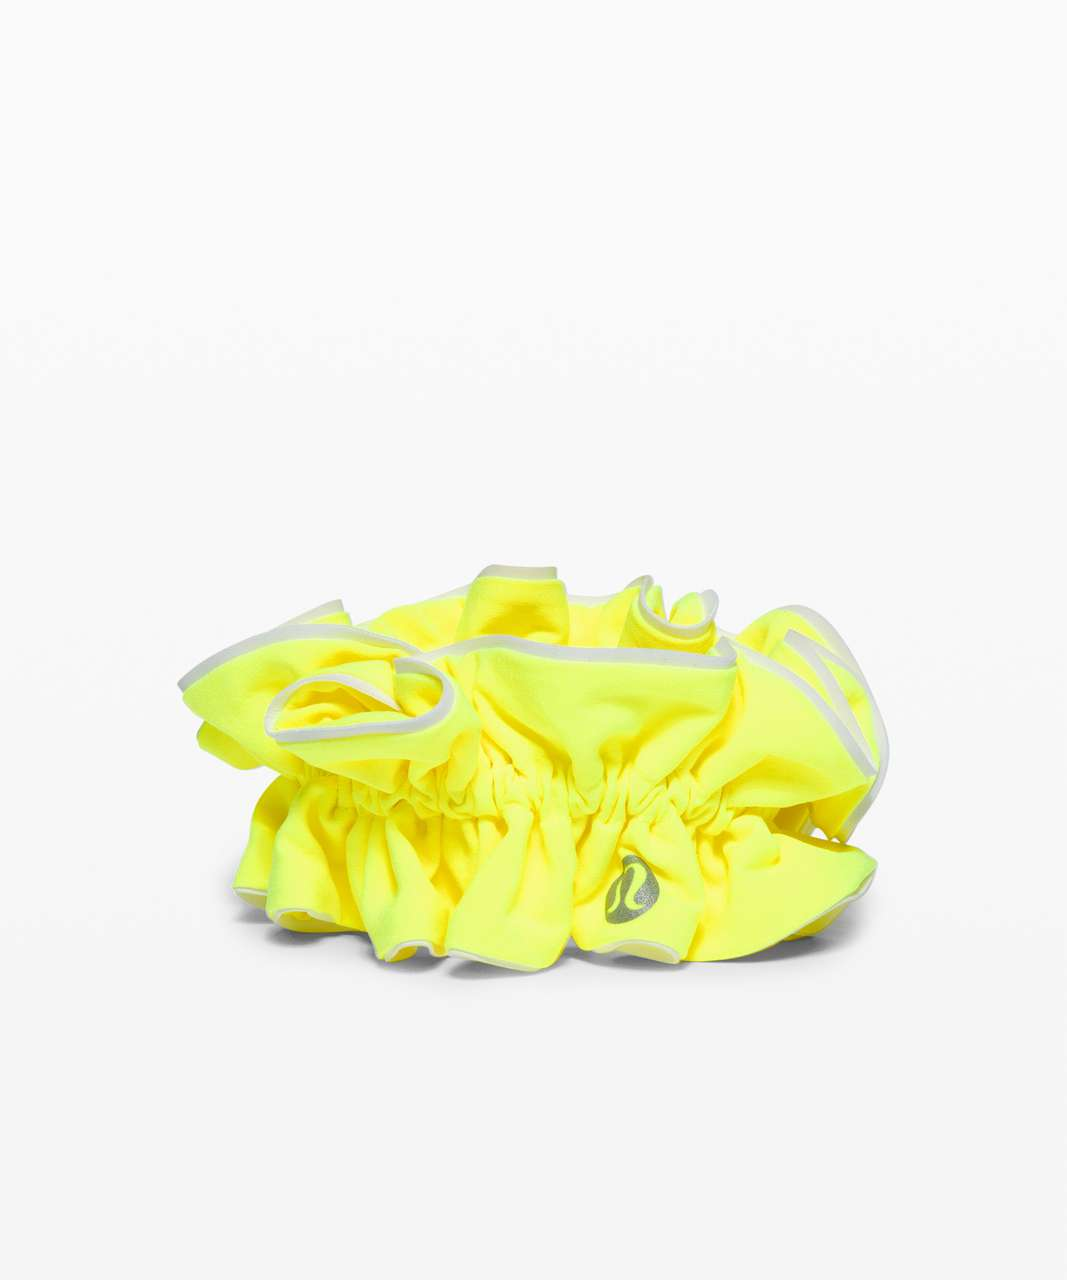 Lululemon Light Locks Scrunchie II - Highlight Yellow